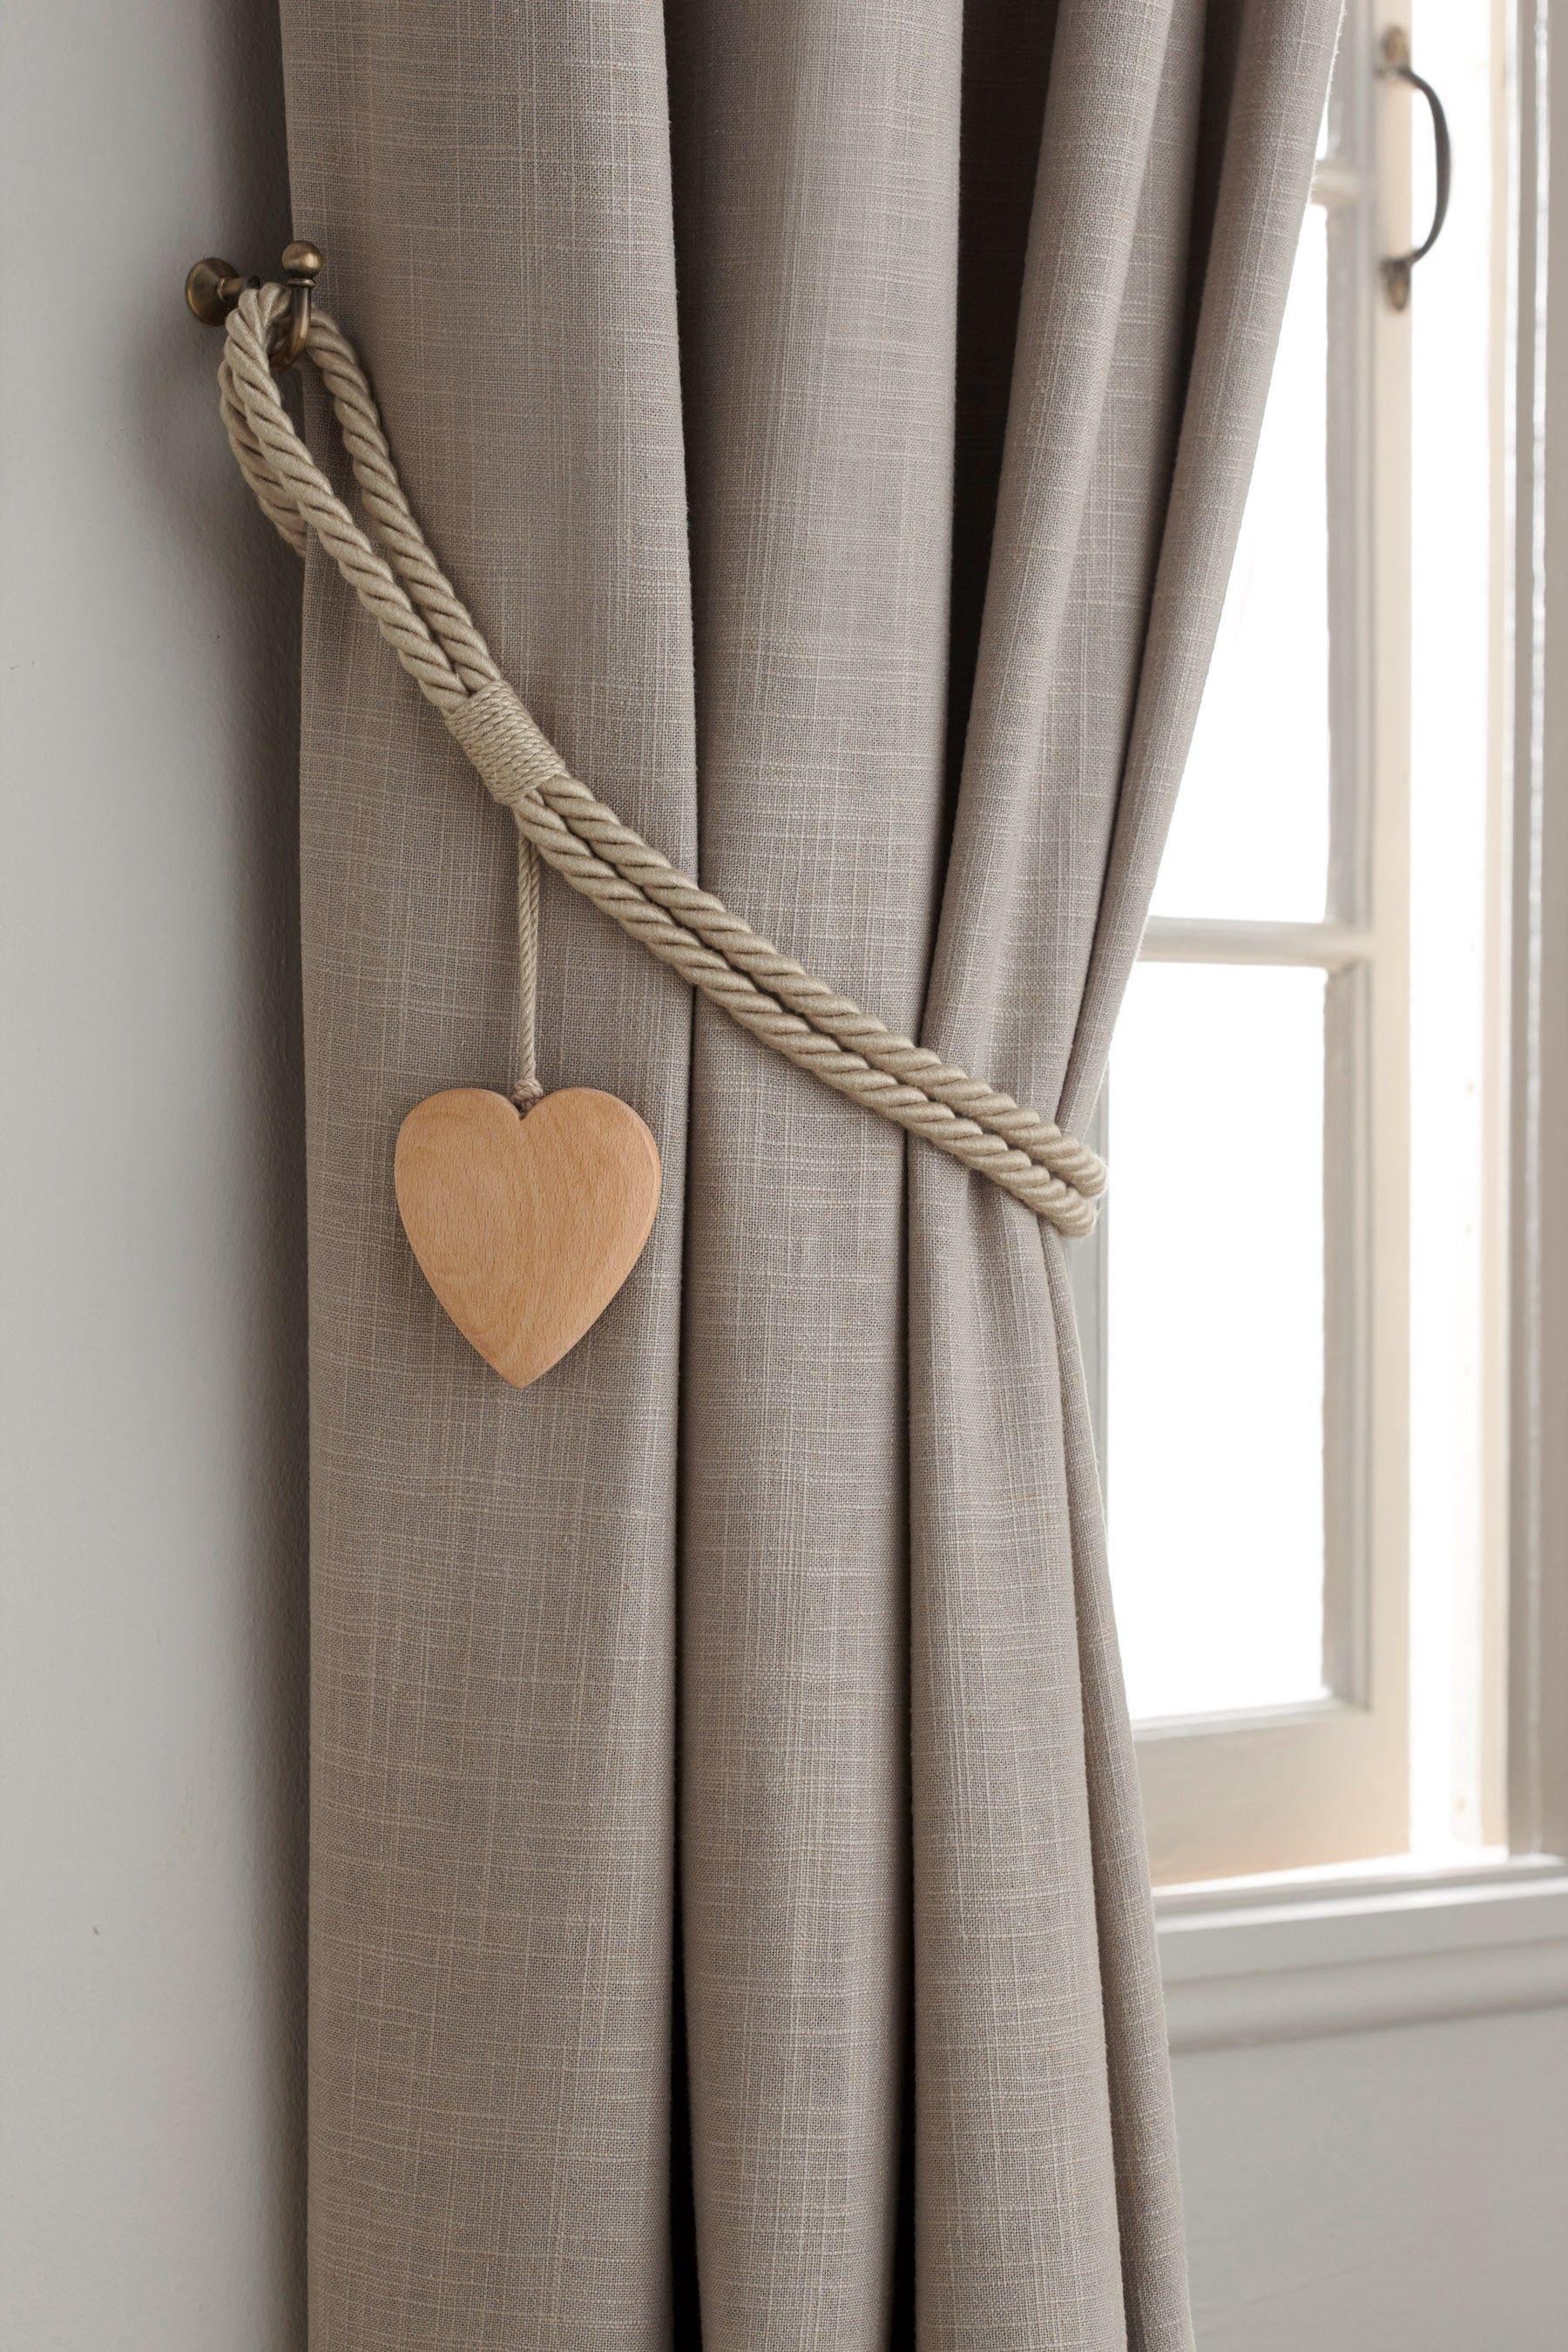 Next Set Of 2 Wooden Heart Tie Backs Natural Ideias De Cortina